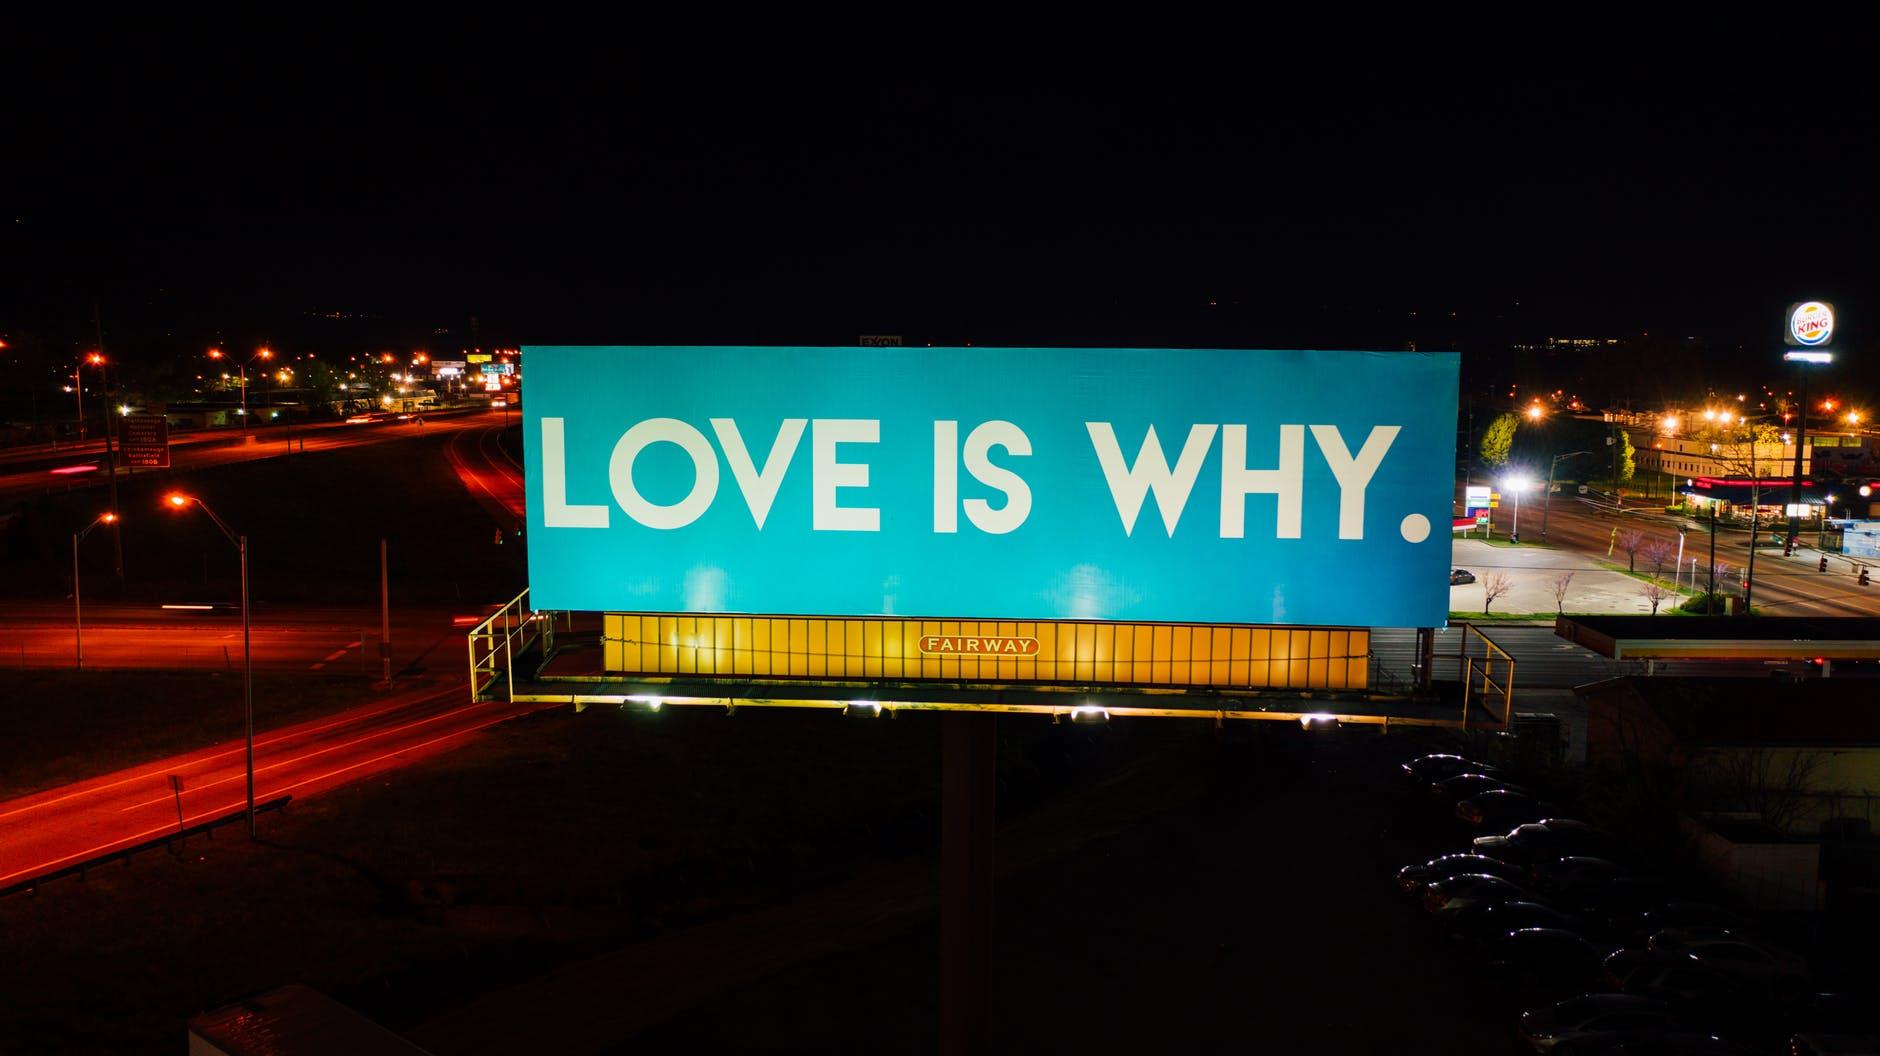 big glowing billboard in city center